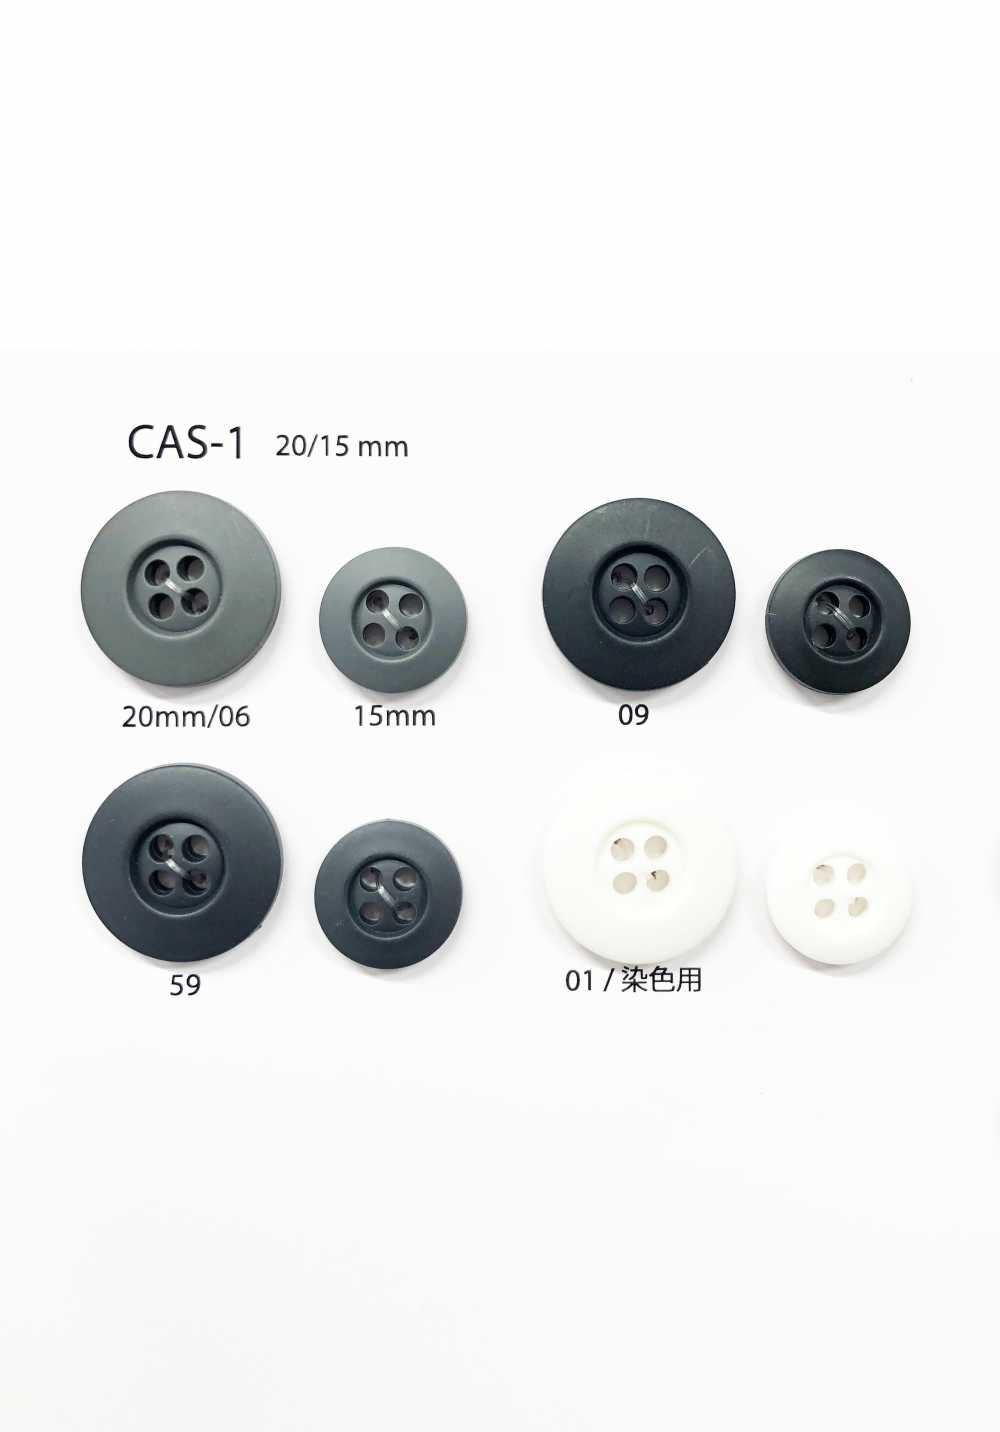 CAS-1 バイオナイロン 4つ穴ボタン アイリス/オークラ商事 - ApparelX アパレル資材卸通販